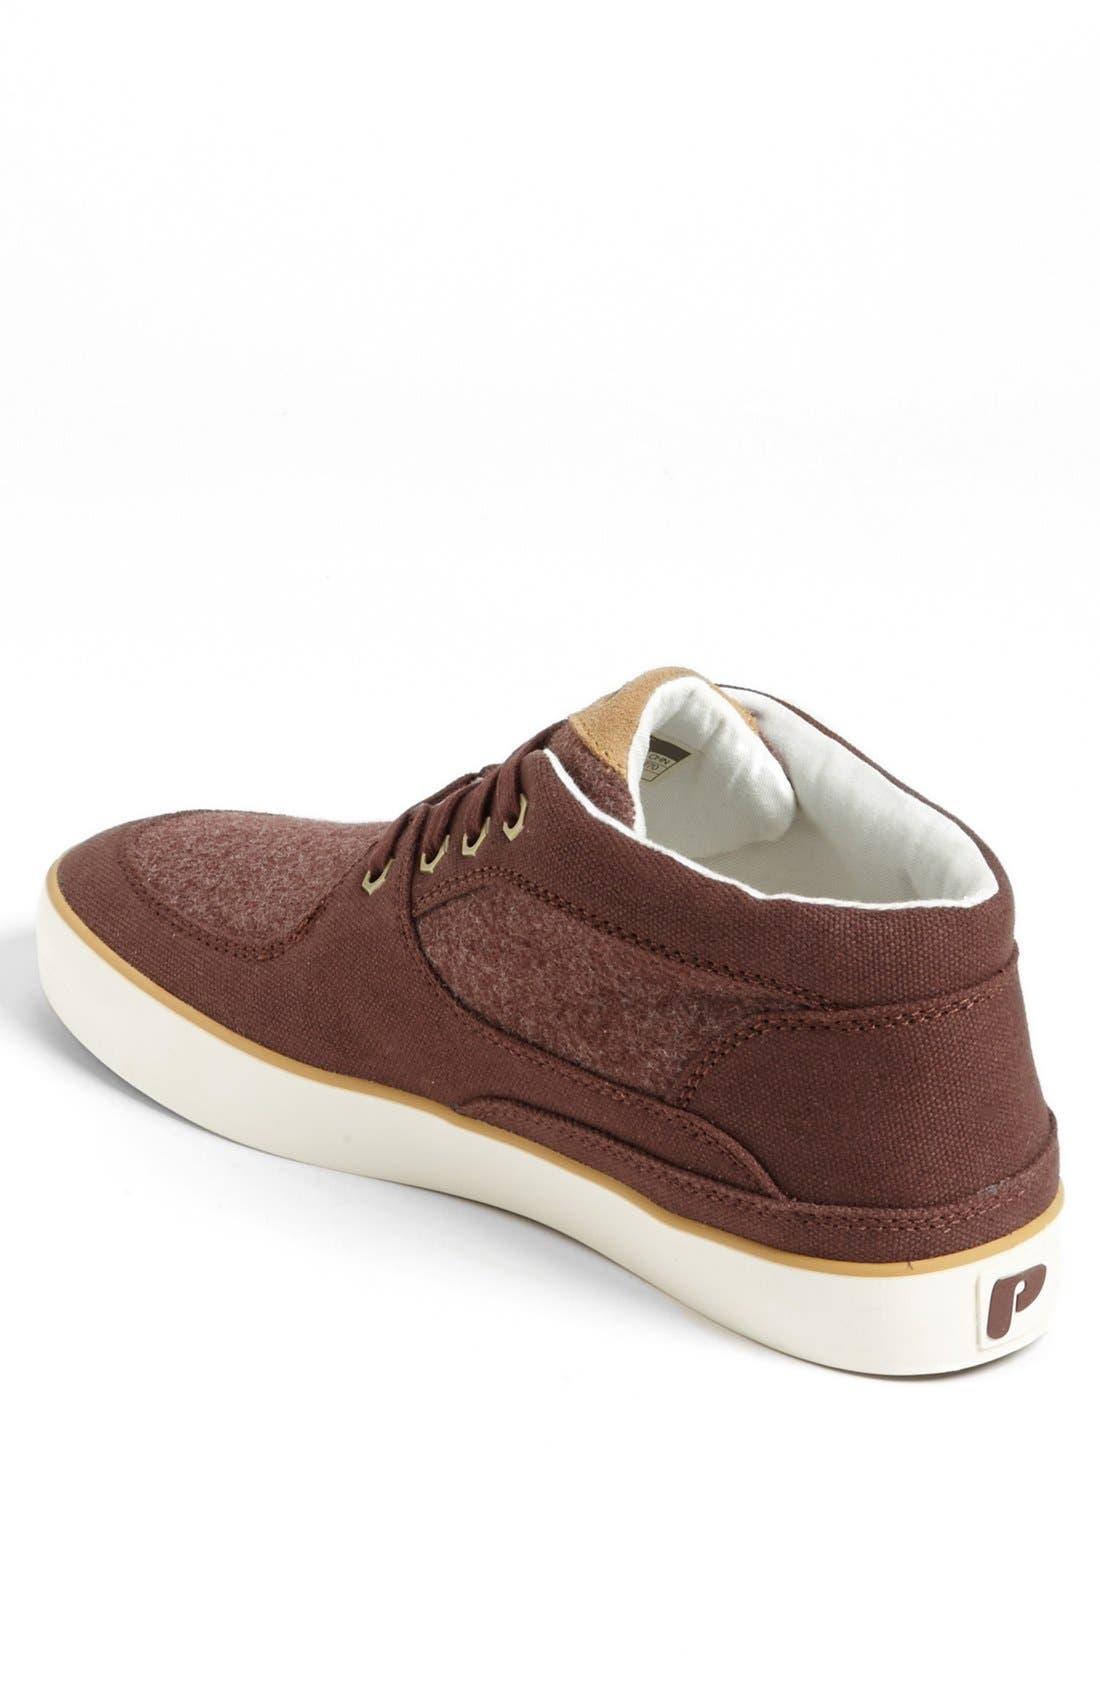 Alternate Image 2  - Pointer 'Mathieson' High Top Sneaker (Men)